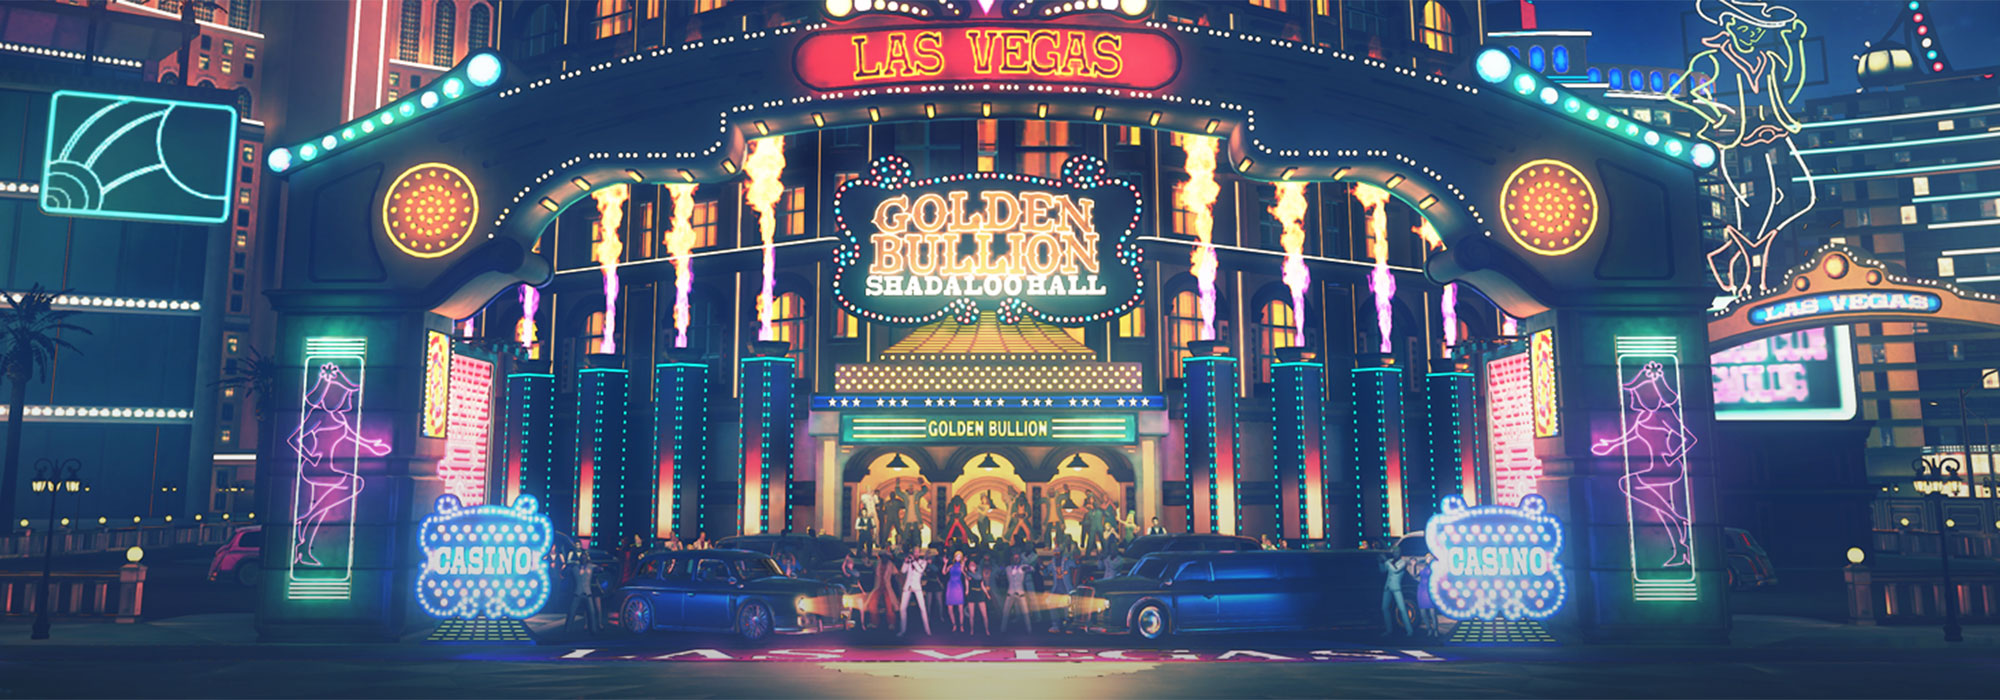 high-rollers-casino